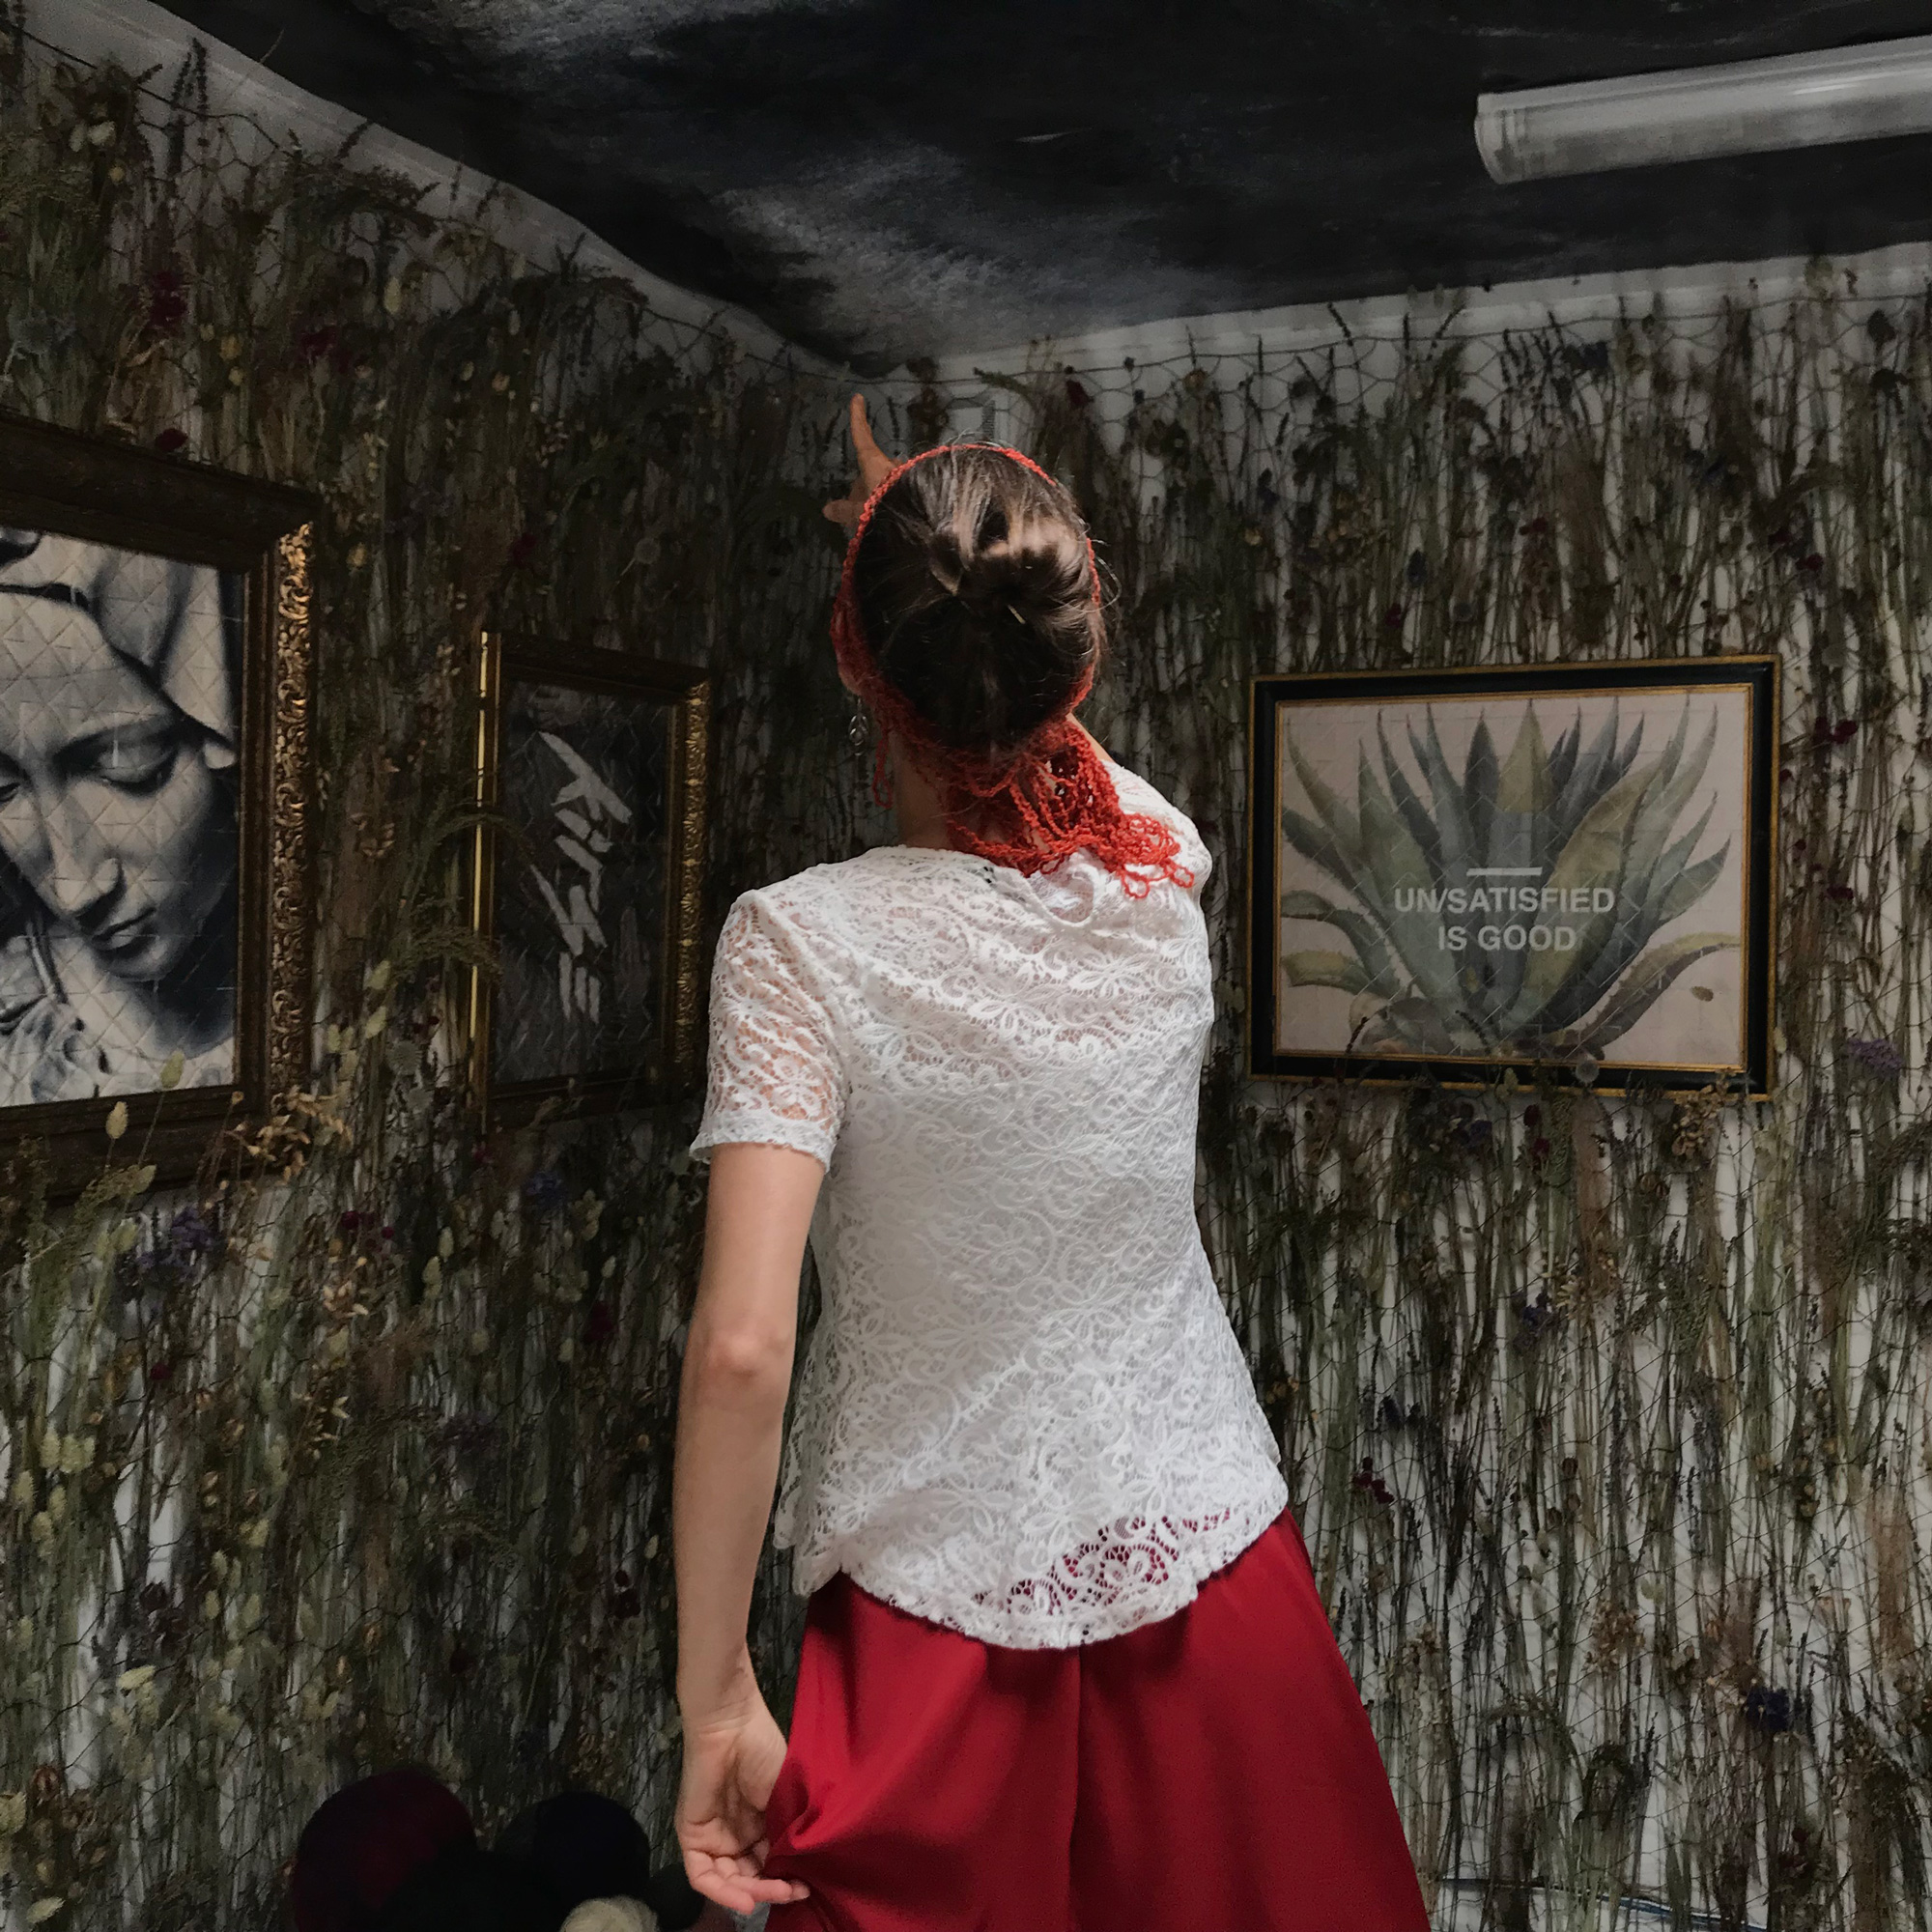 The Weaver Girl — performed by Juliana Appel at ZOLITUDE SWAMP — AARHUSMAKERS, END OF THE LINE